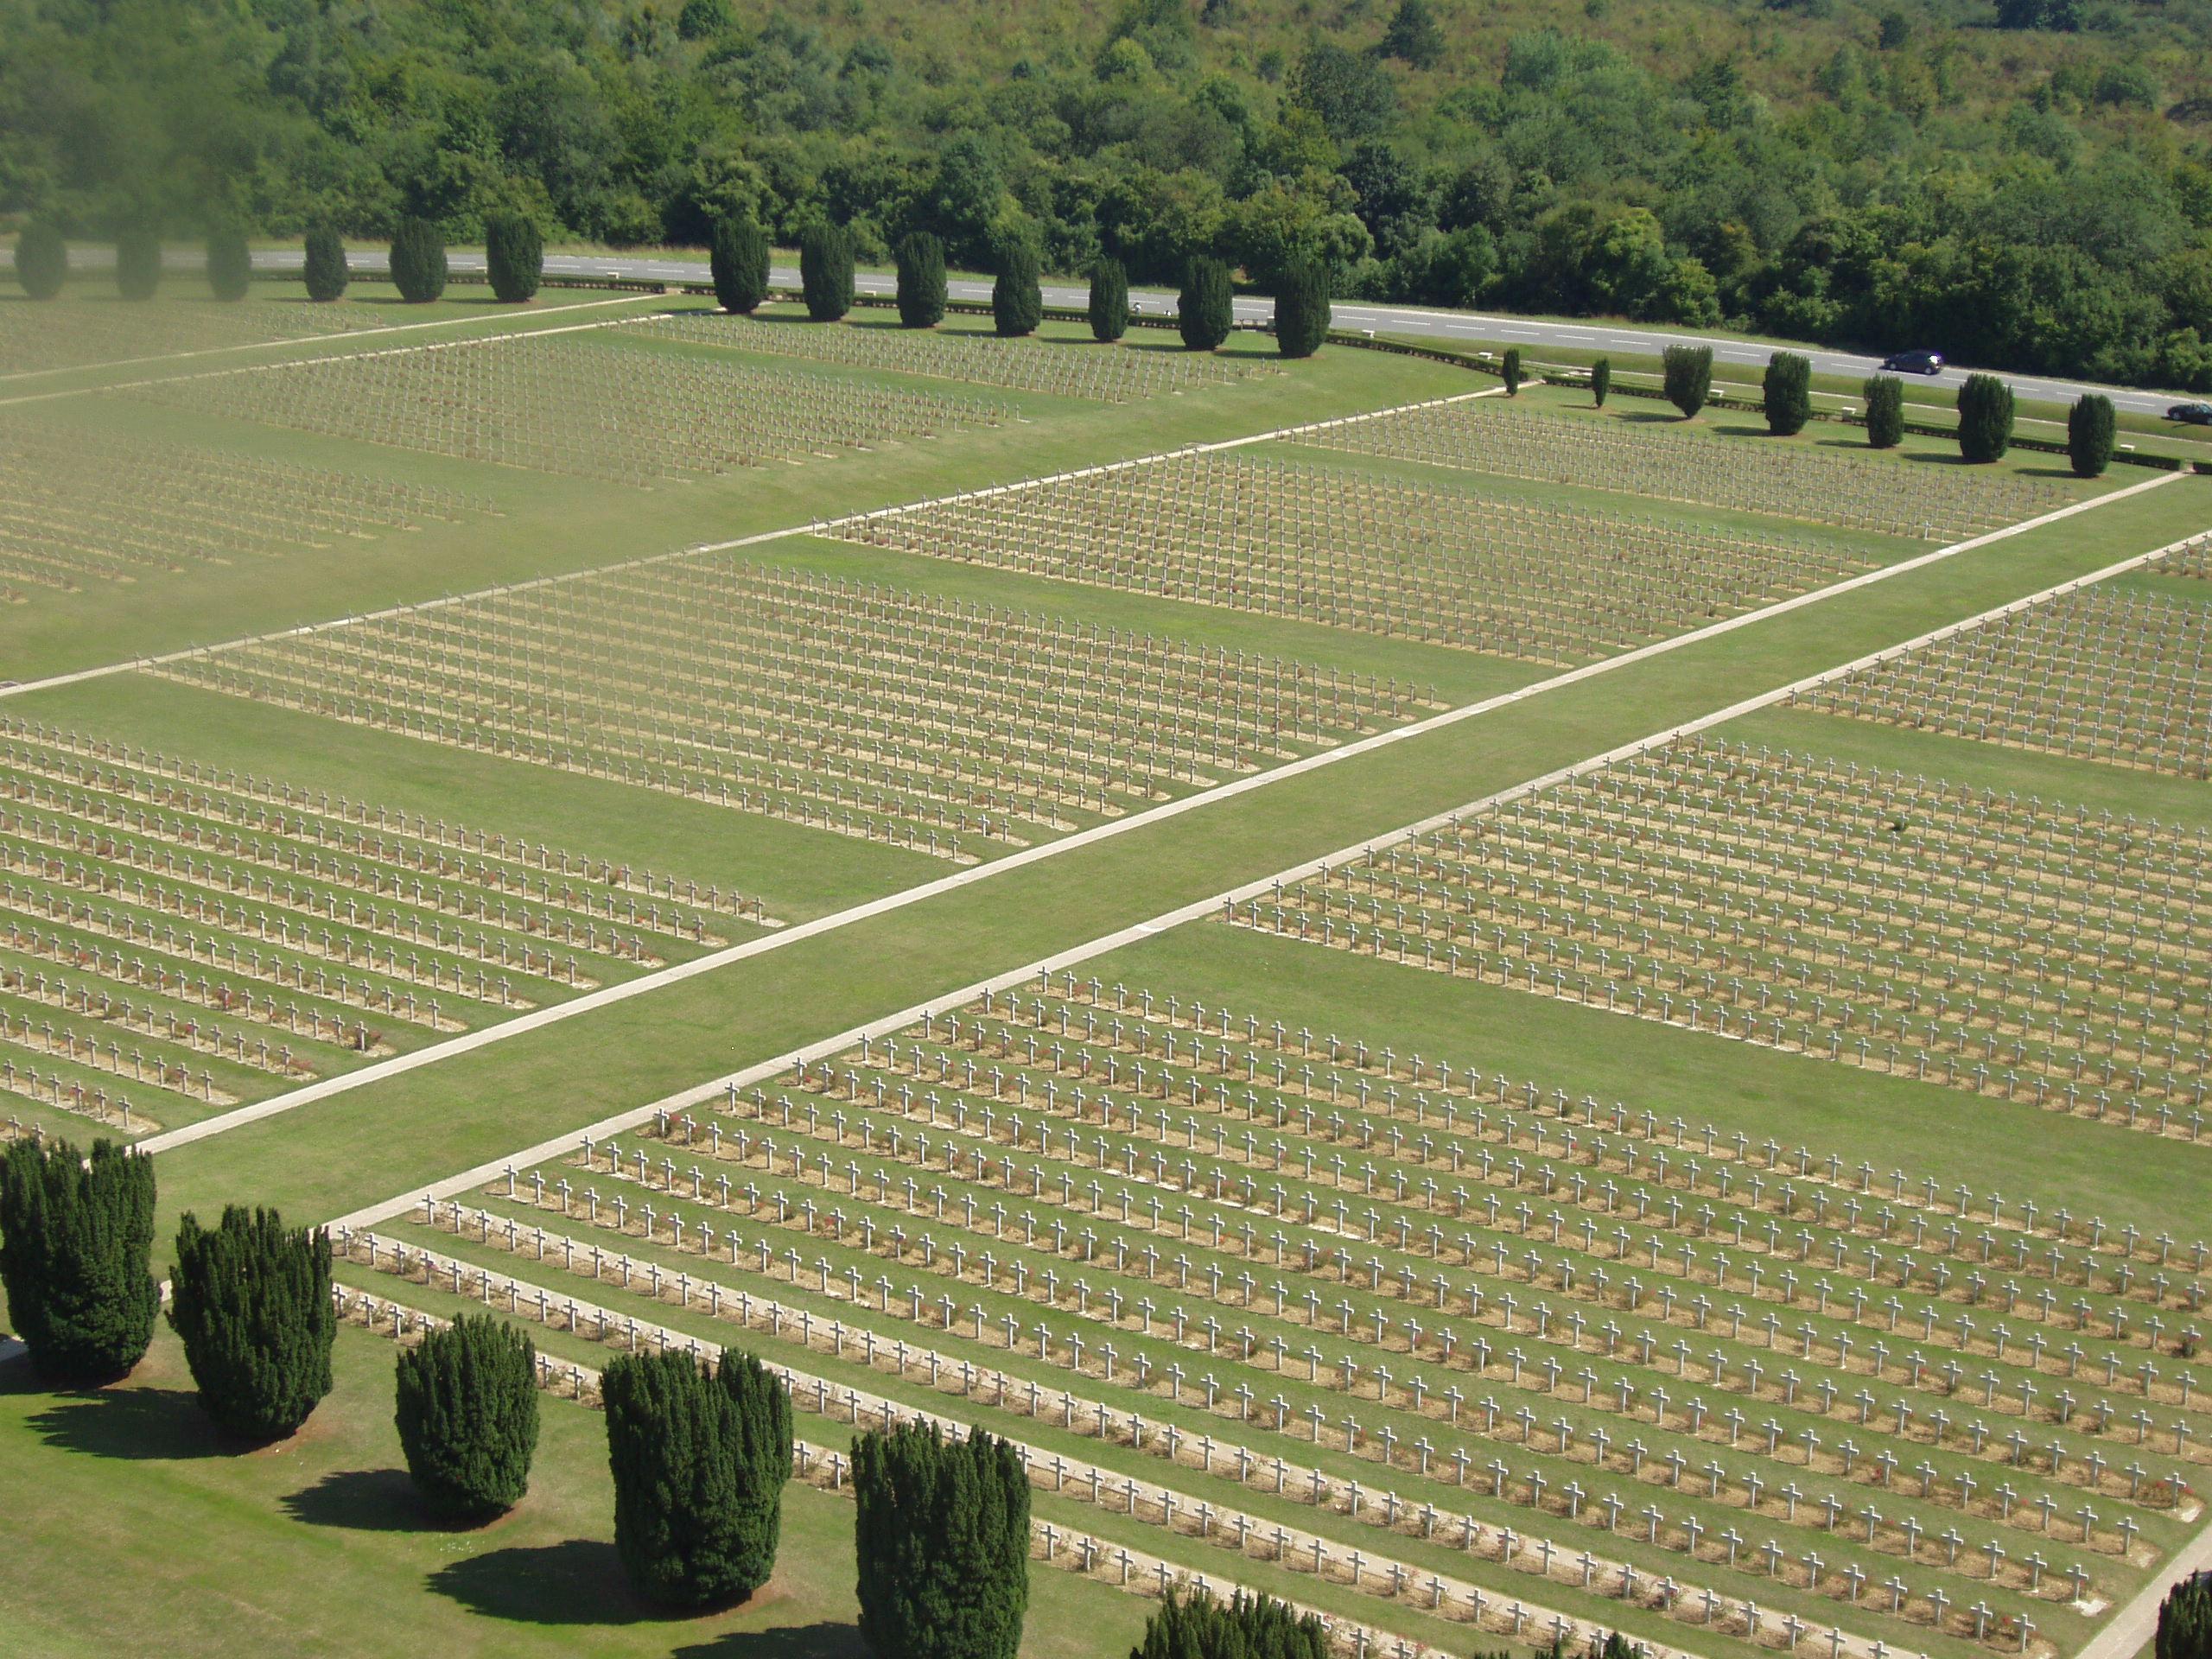 Graveyard in France